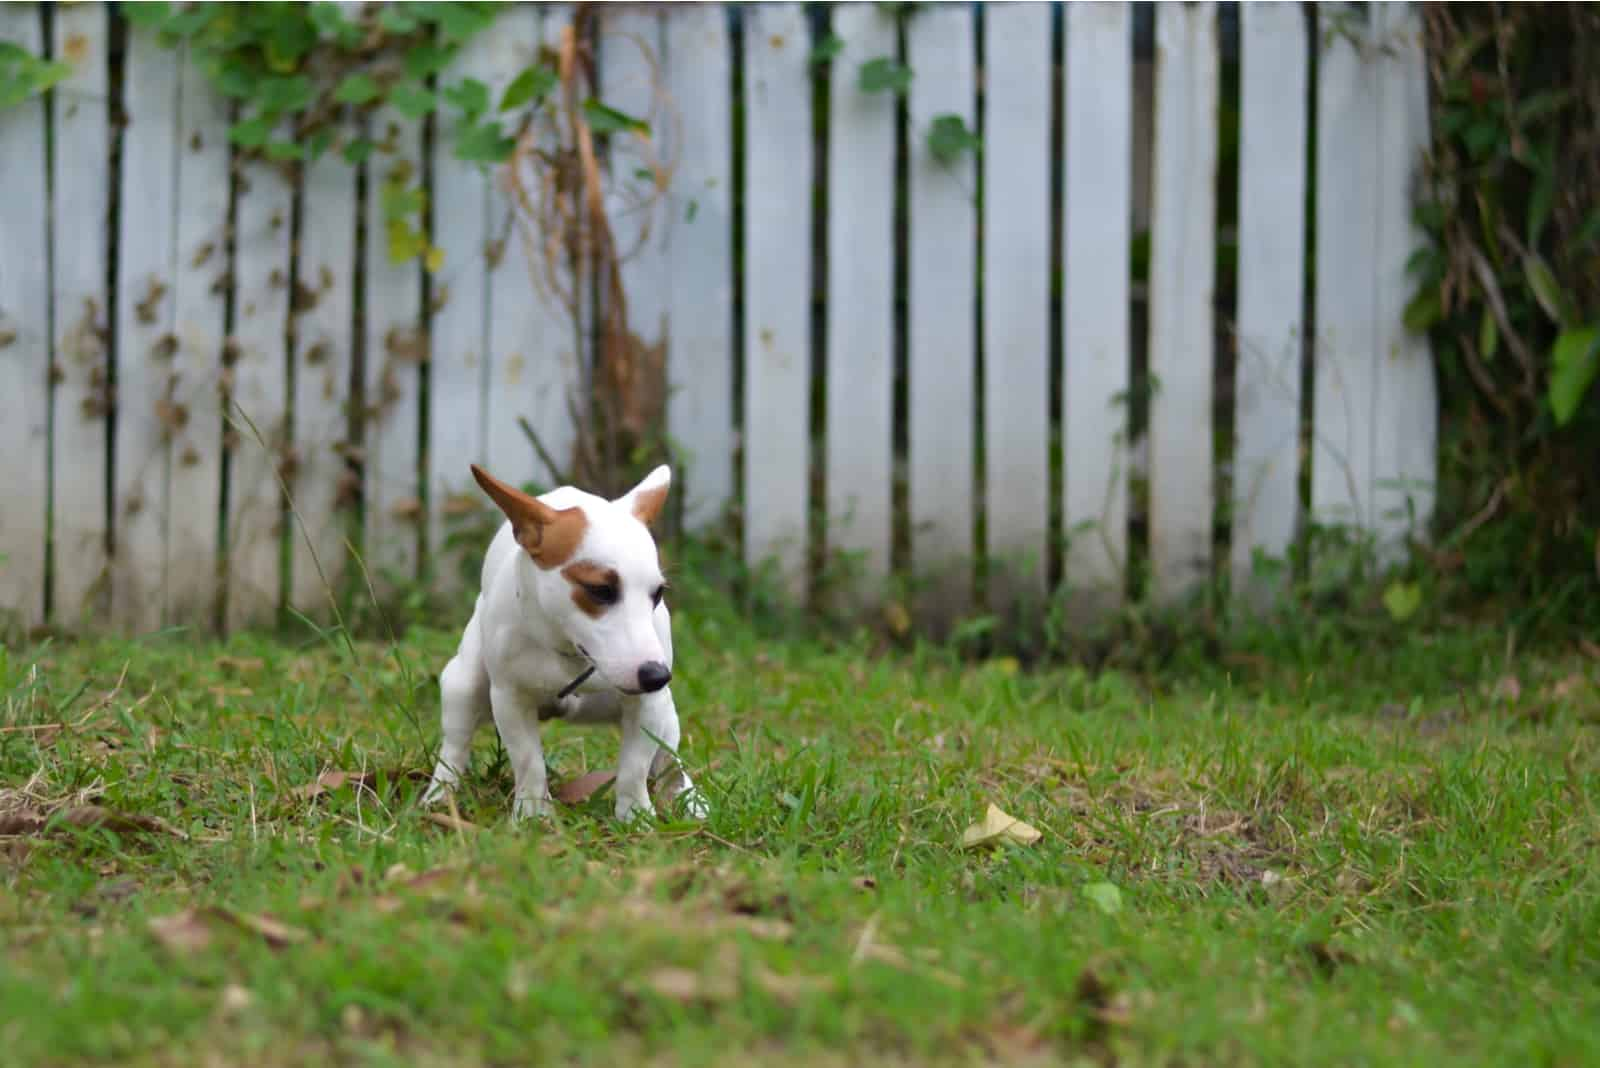 dog defecates on the grass